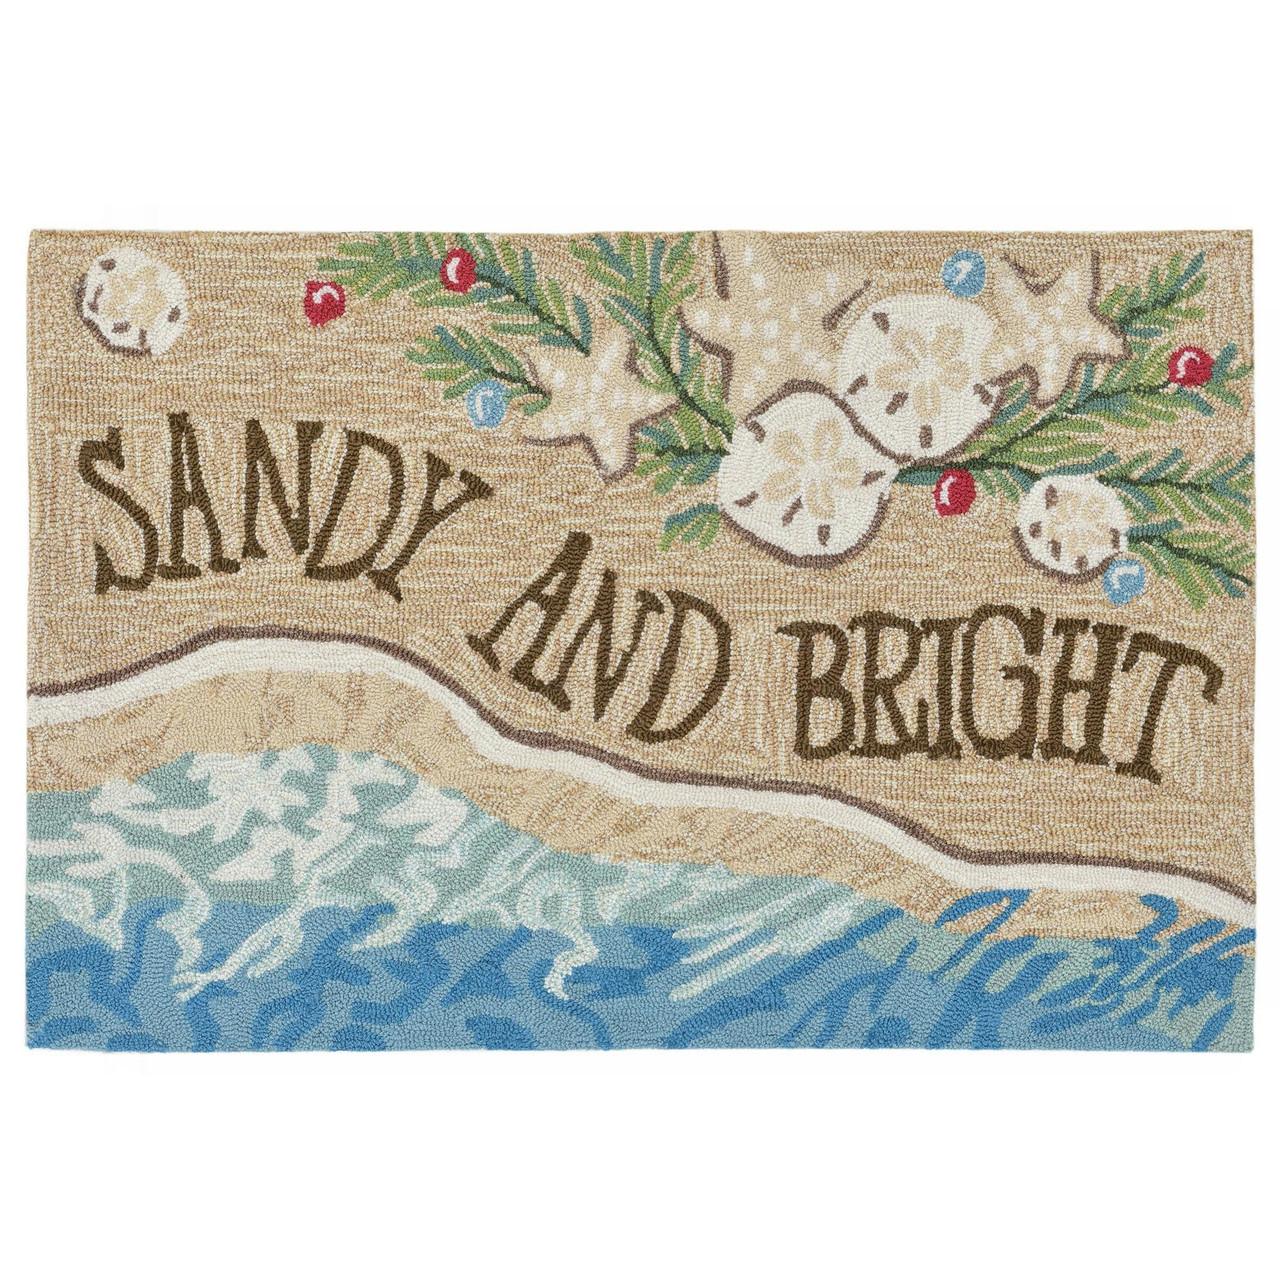 "Frontporch ""Sandy and Bright"" Indoor/Outdoor Rug"